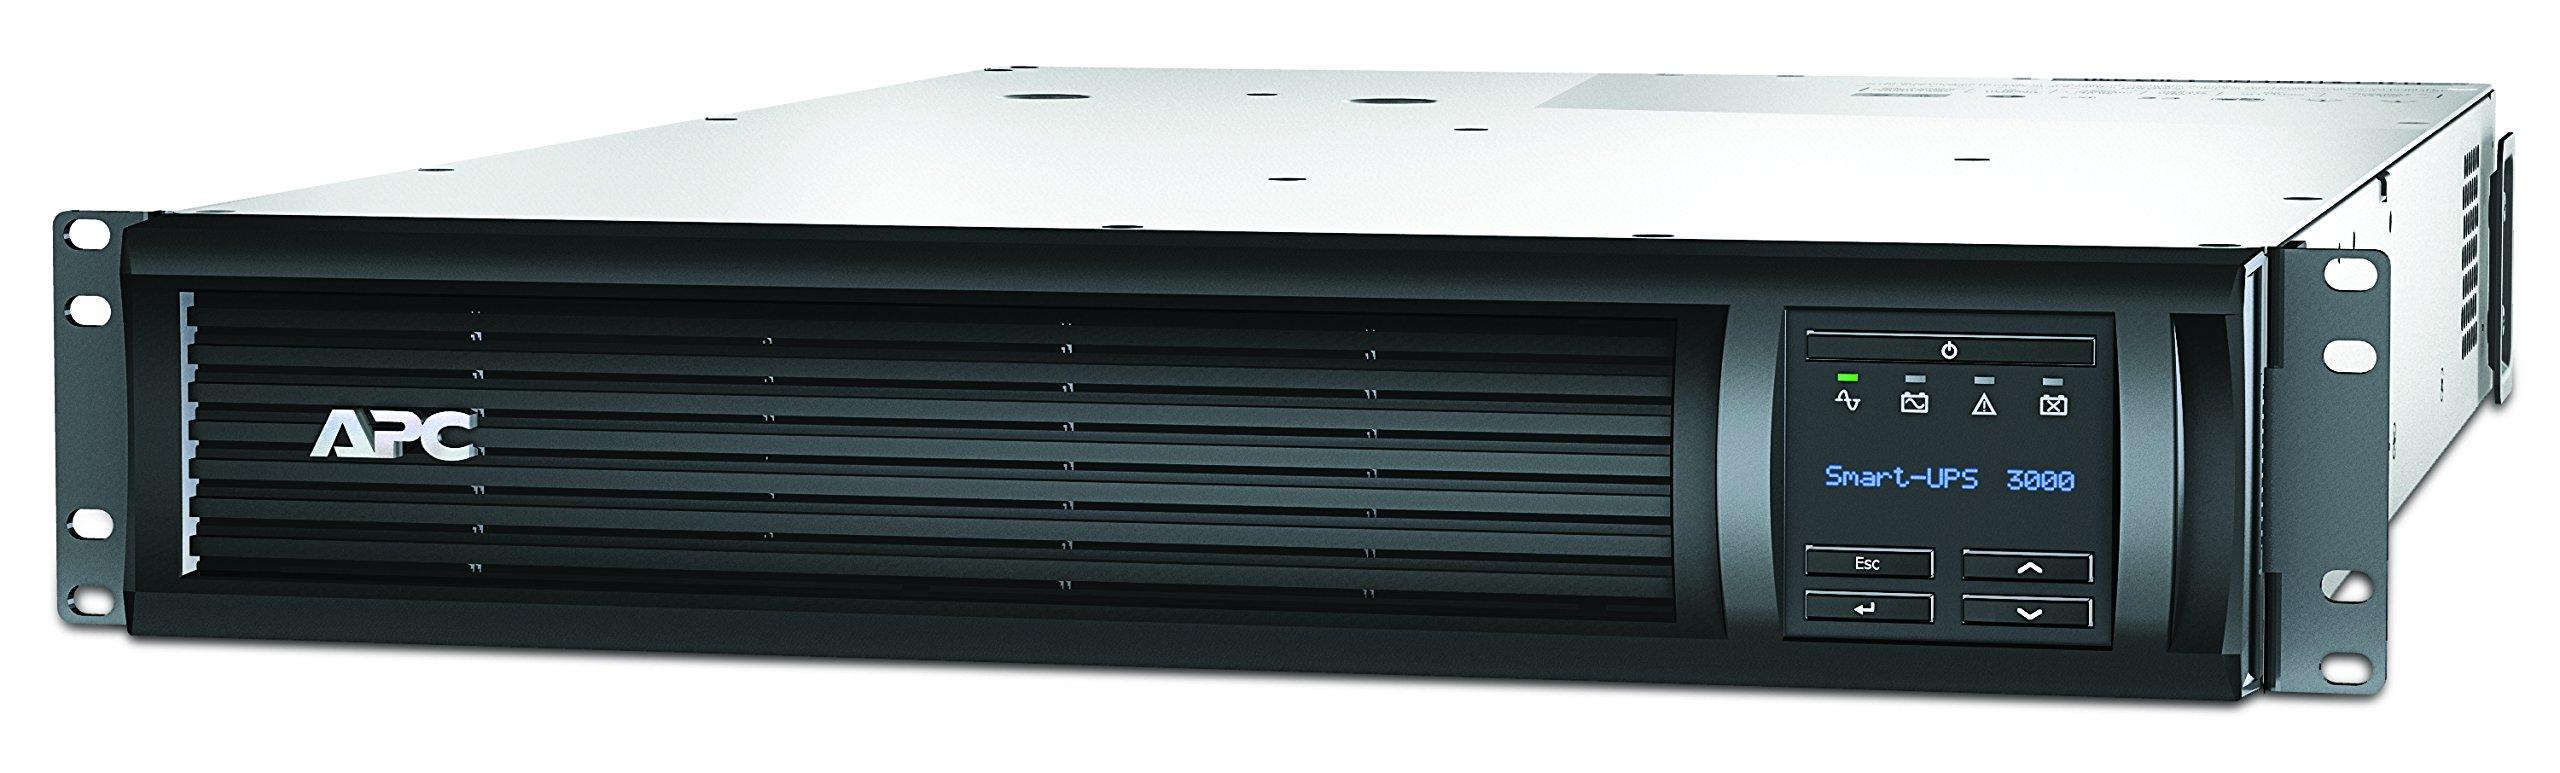 APC 3000VA Smart-UPS with SmartConnect, Pure Sine Wave UPS Battery Backup & Surge Protection, Rackmount UPS (SMT3000RM2UC)